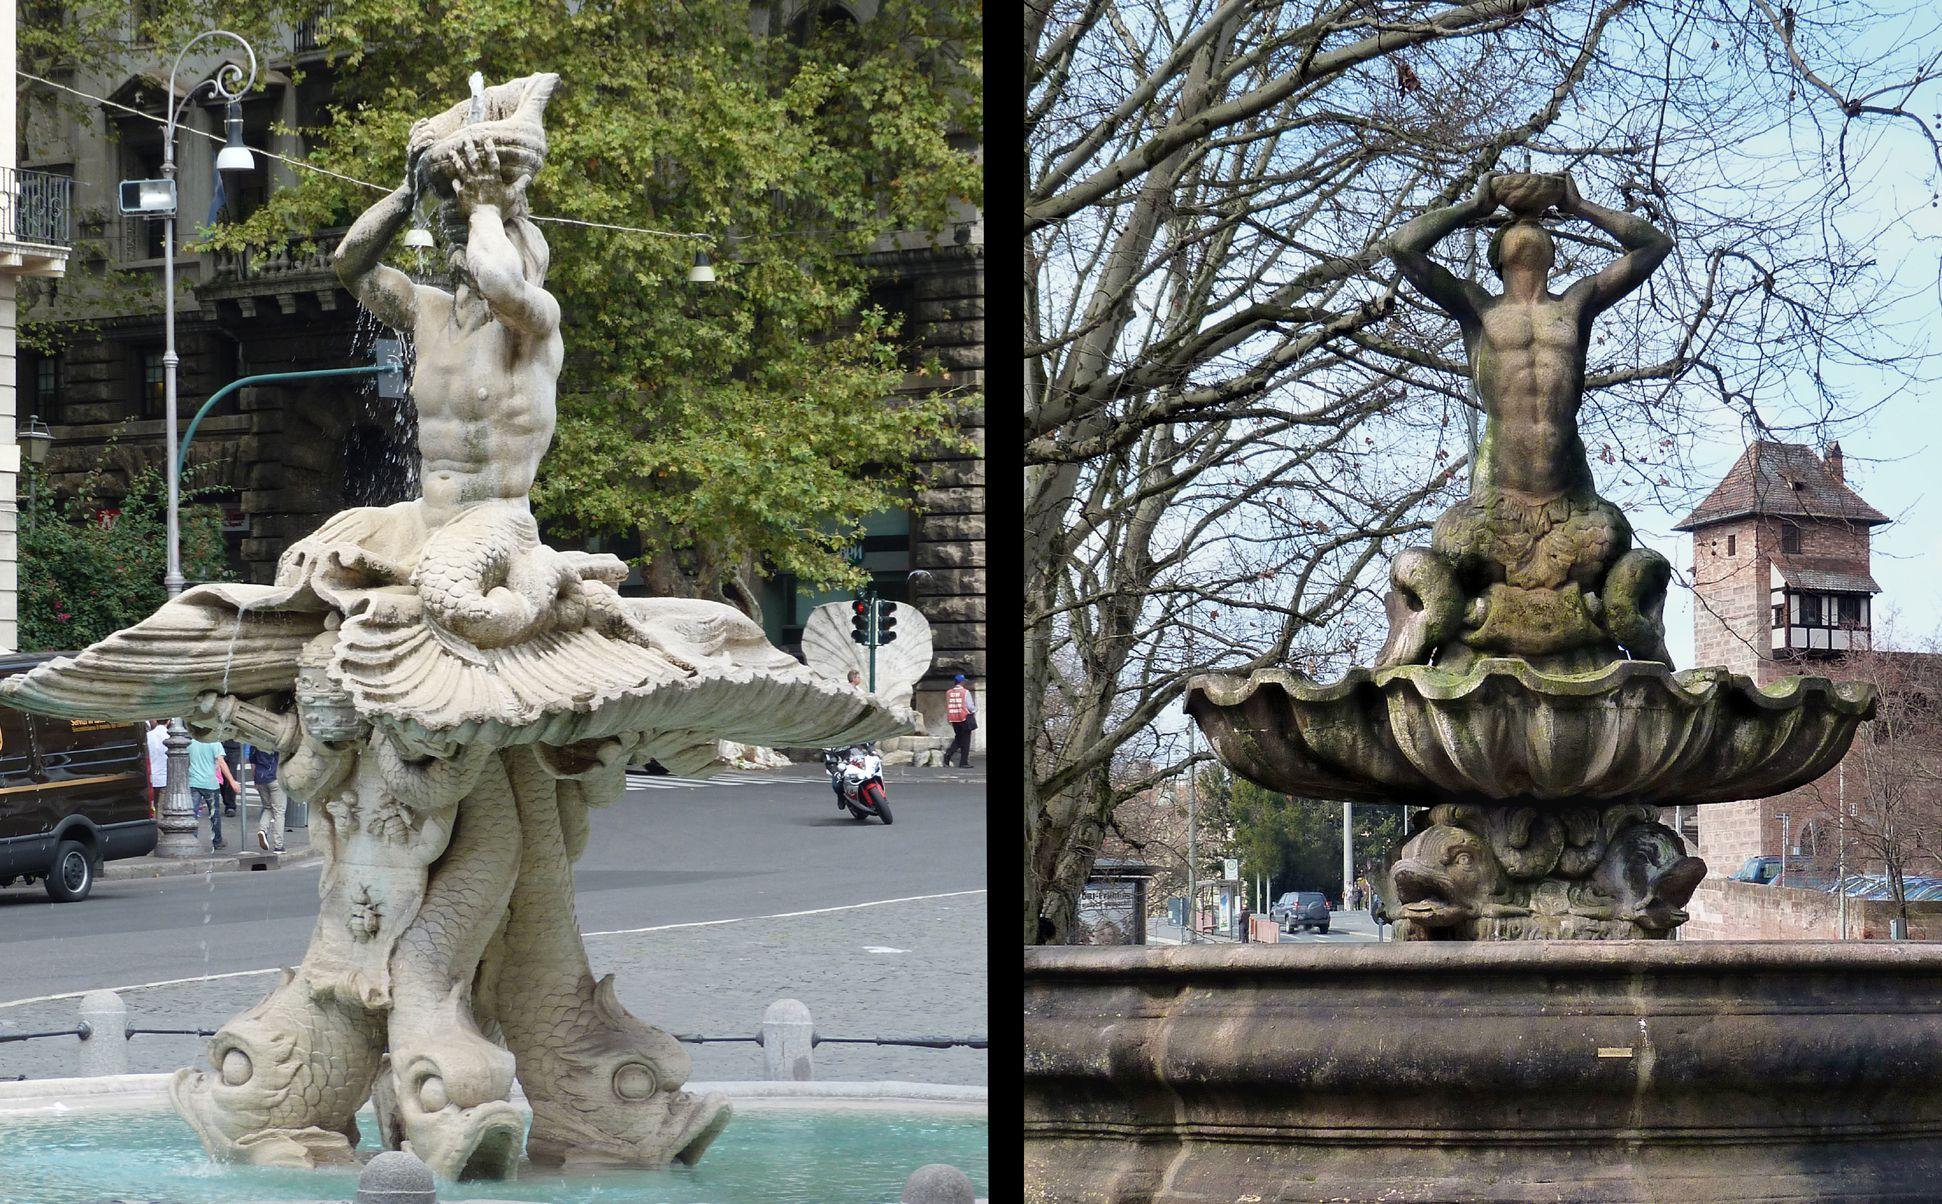 Tritonbrunnen Rom / Nürnberg, Fontana del Tritone, frontal